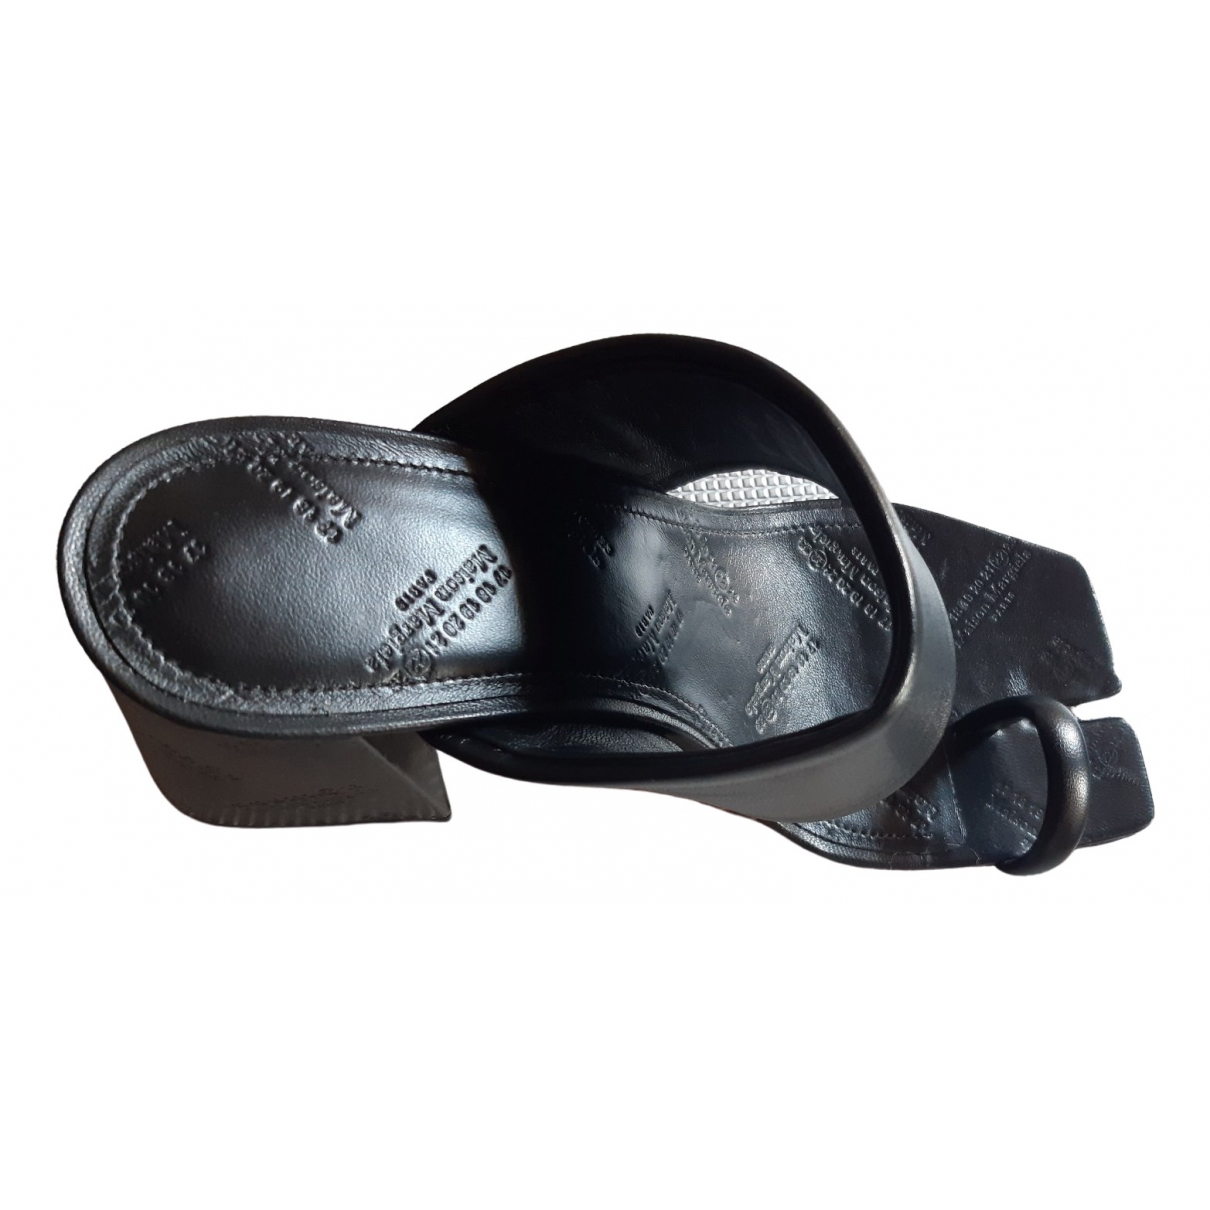 Maison Martin Margiela \N Black Leather Sandals for Women 38 EU